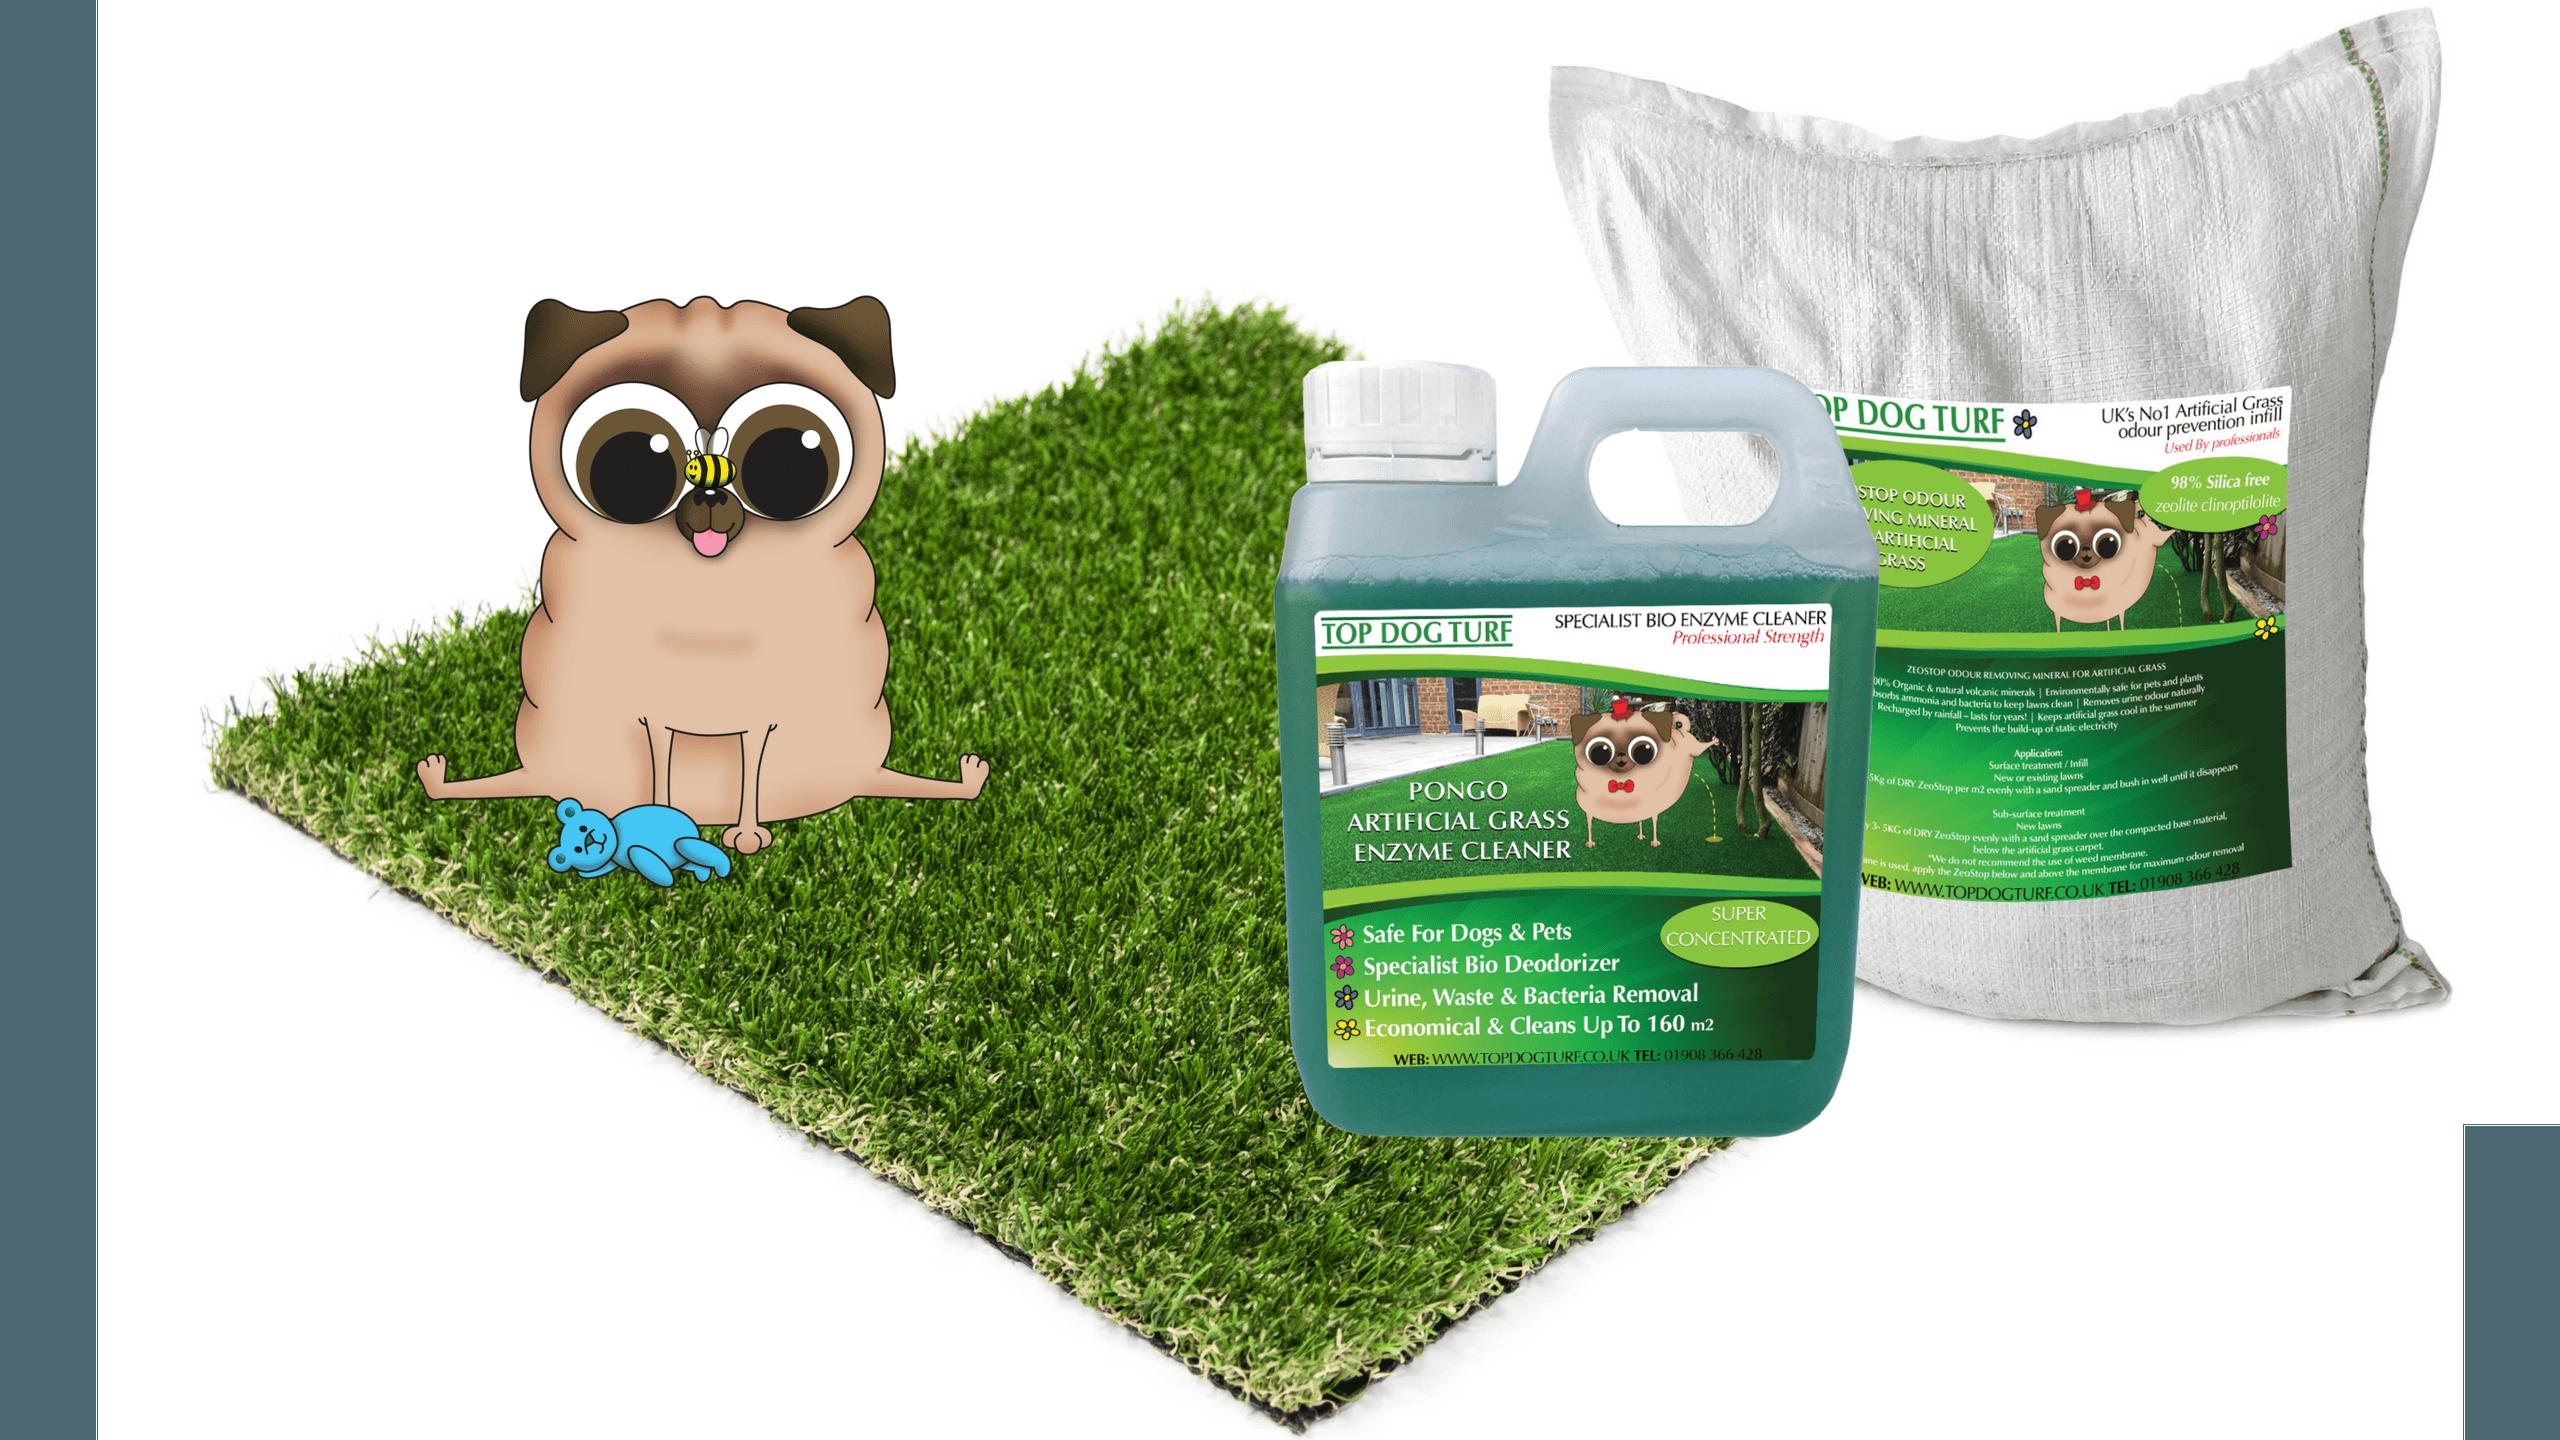 Best artificial grass deodoriser for dog urine